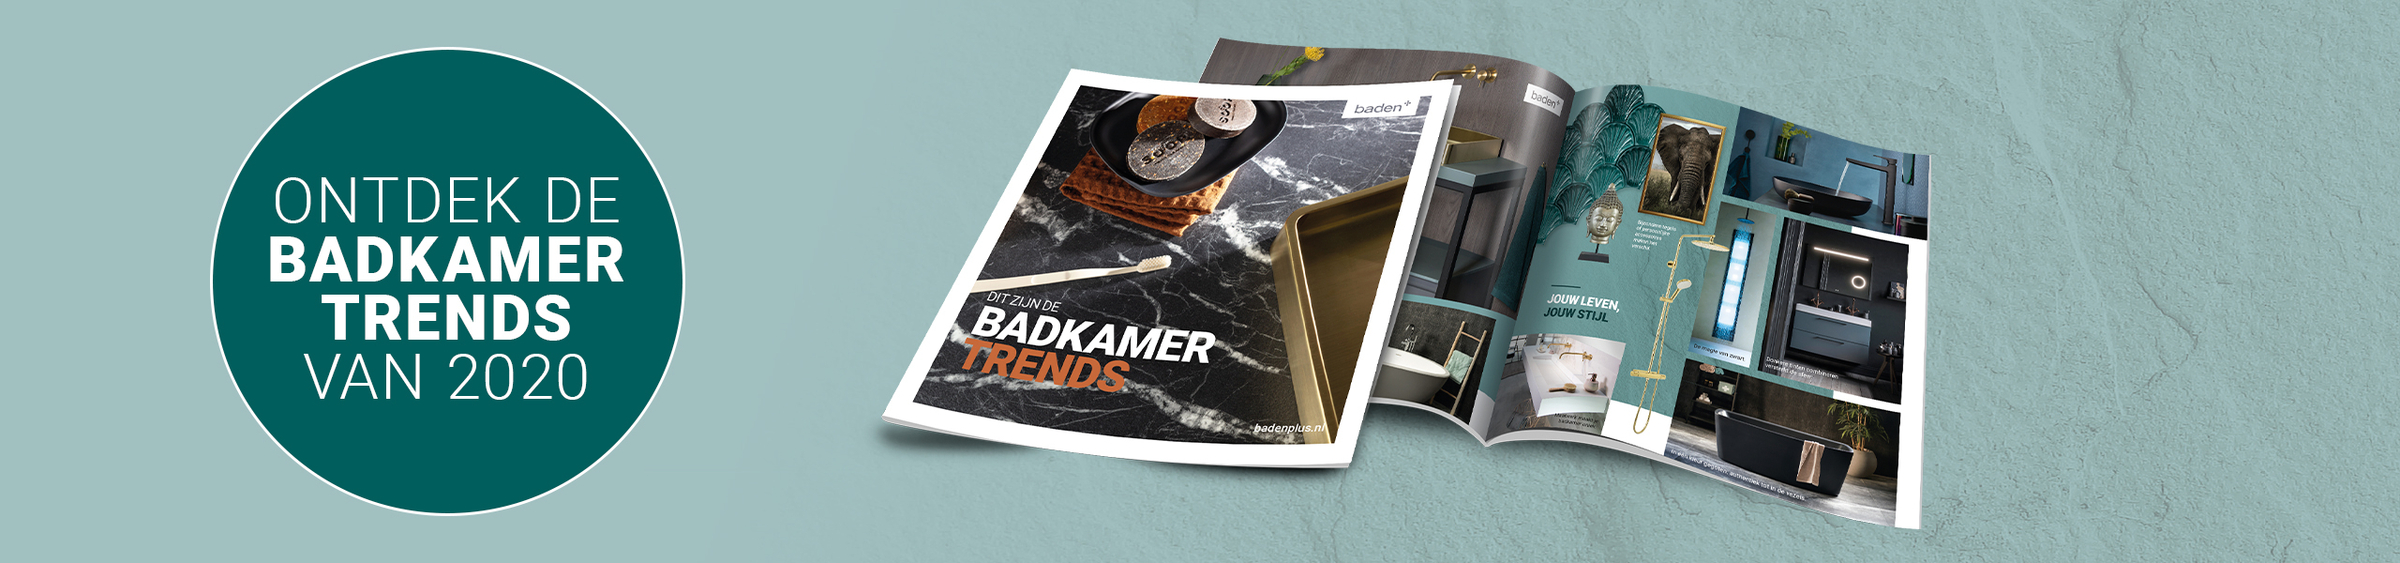 Baden+ trendfolder 2020 - Baden+ trendfolder 2020